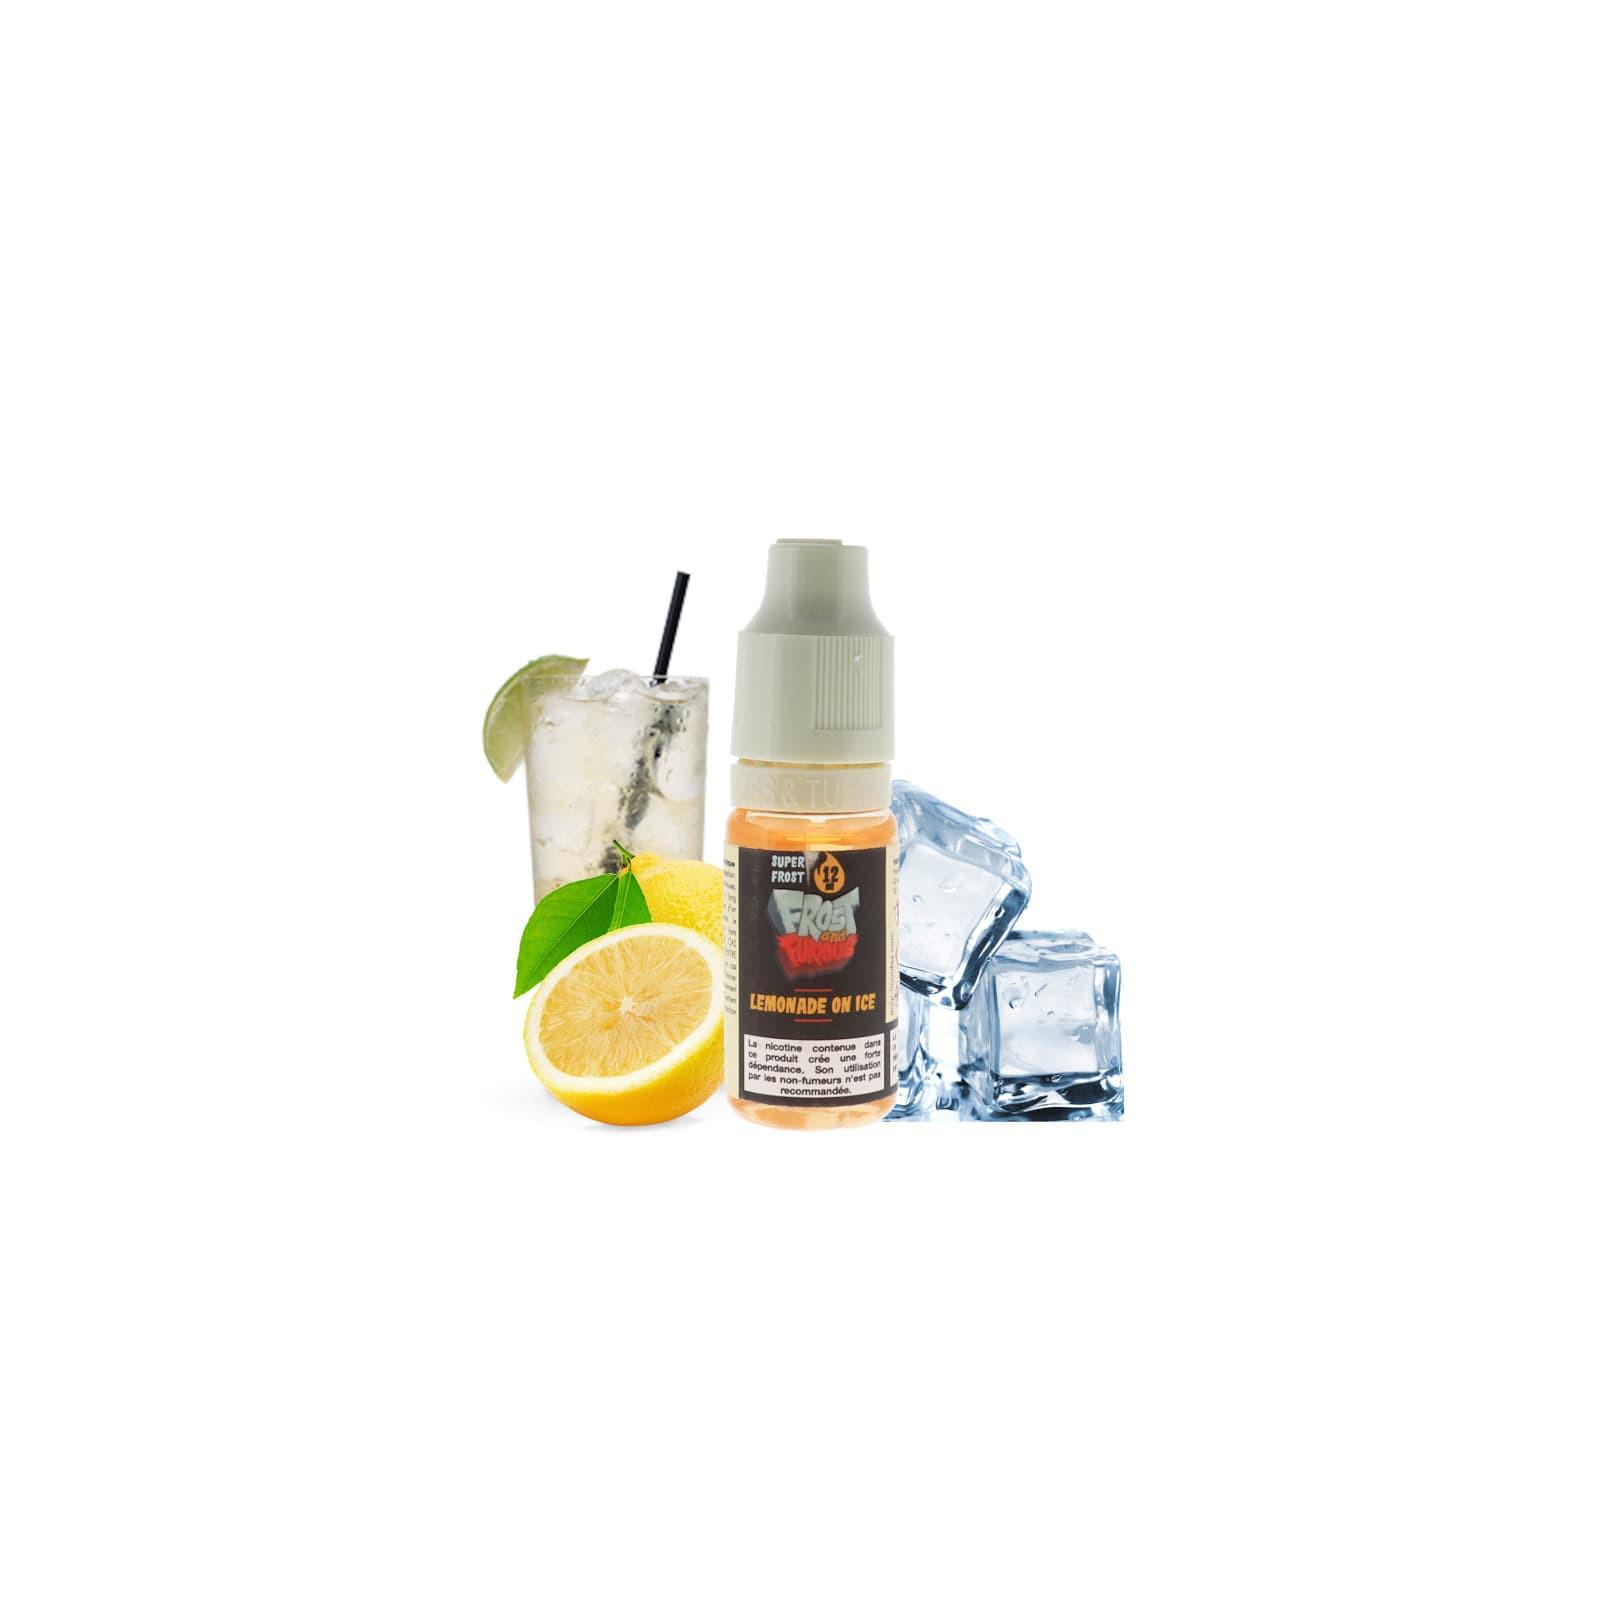 Lemonade on Ice Super Frost 10 ml - Pulp